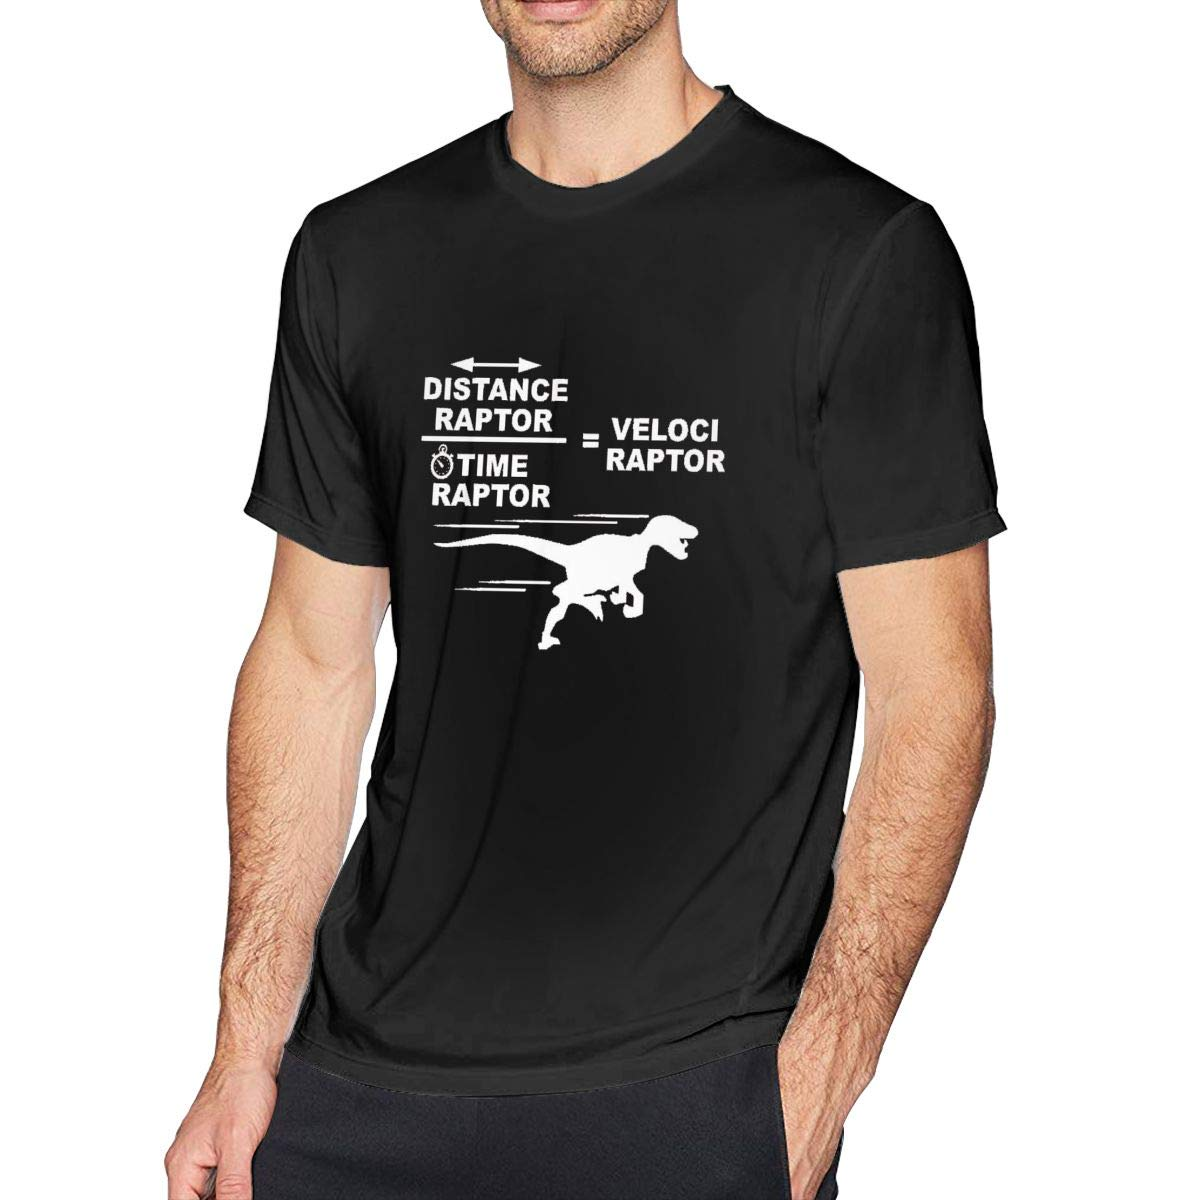 Joy007 S Tshirt Crew Neck Distance Raptor Divided By Time Raptor Equals Velociraptor